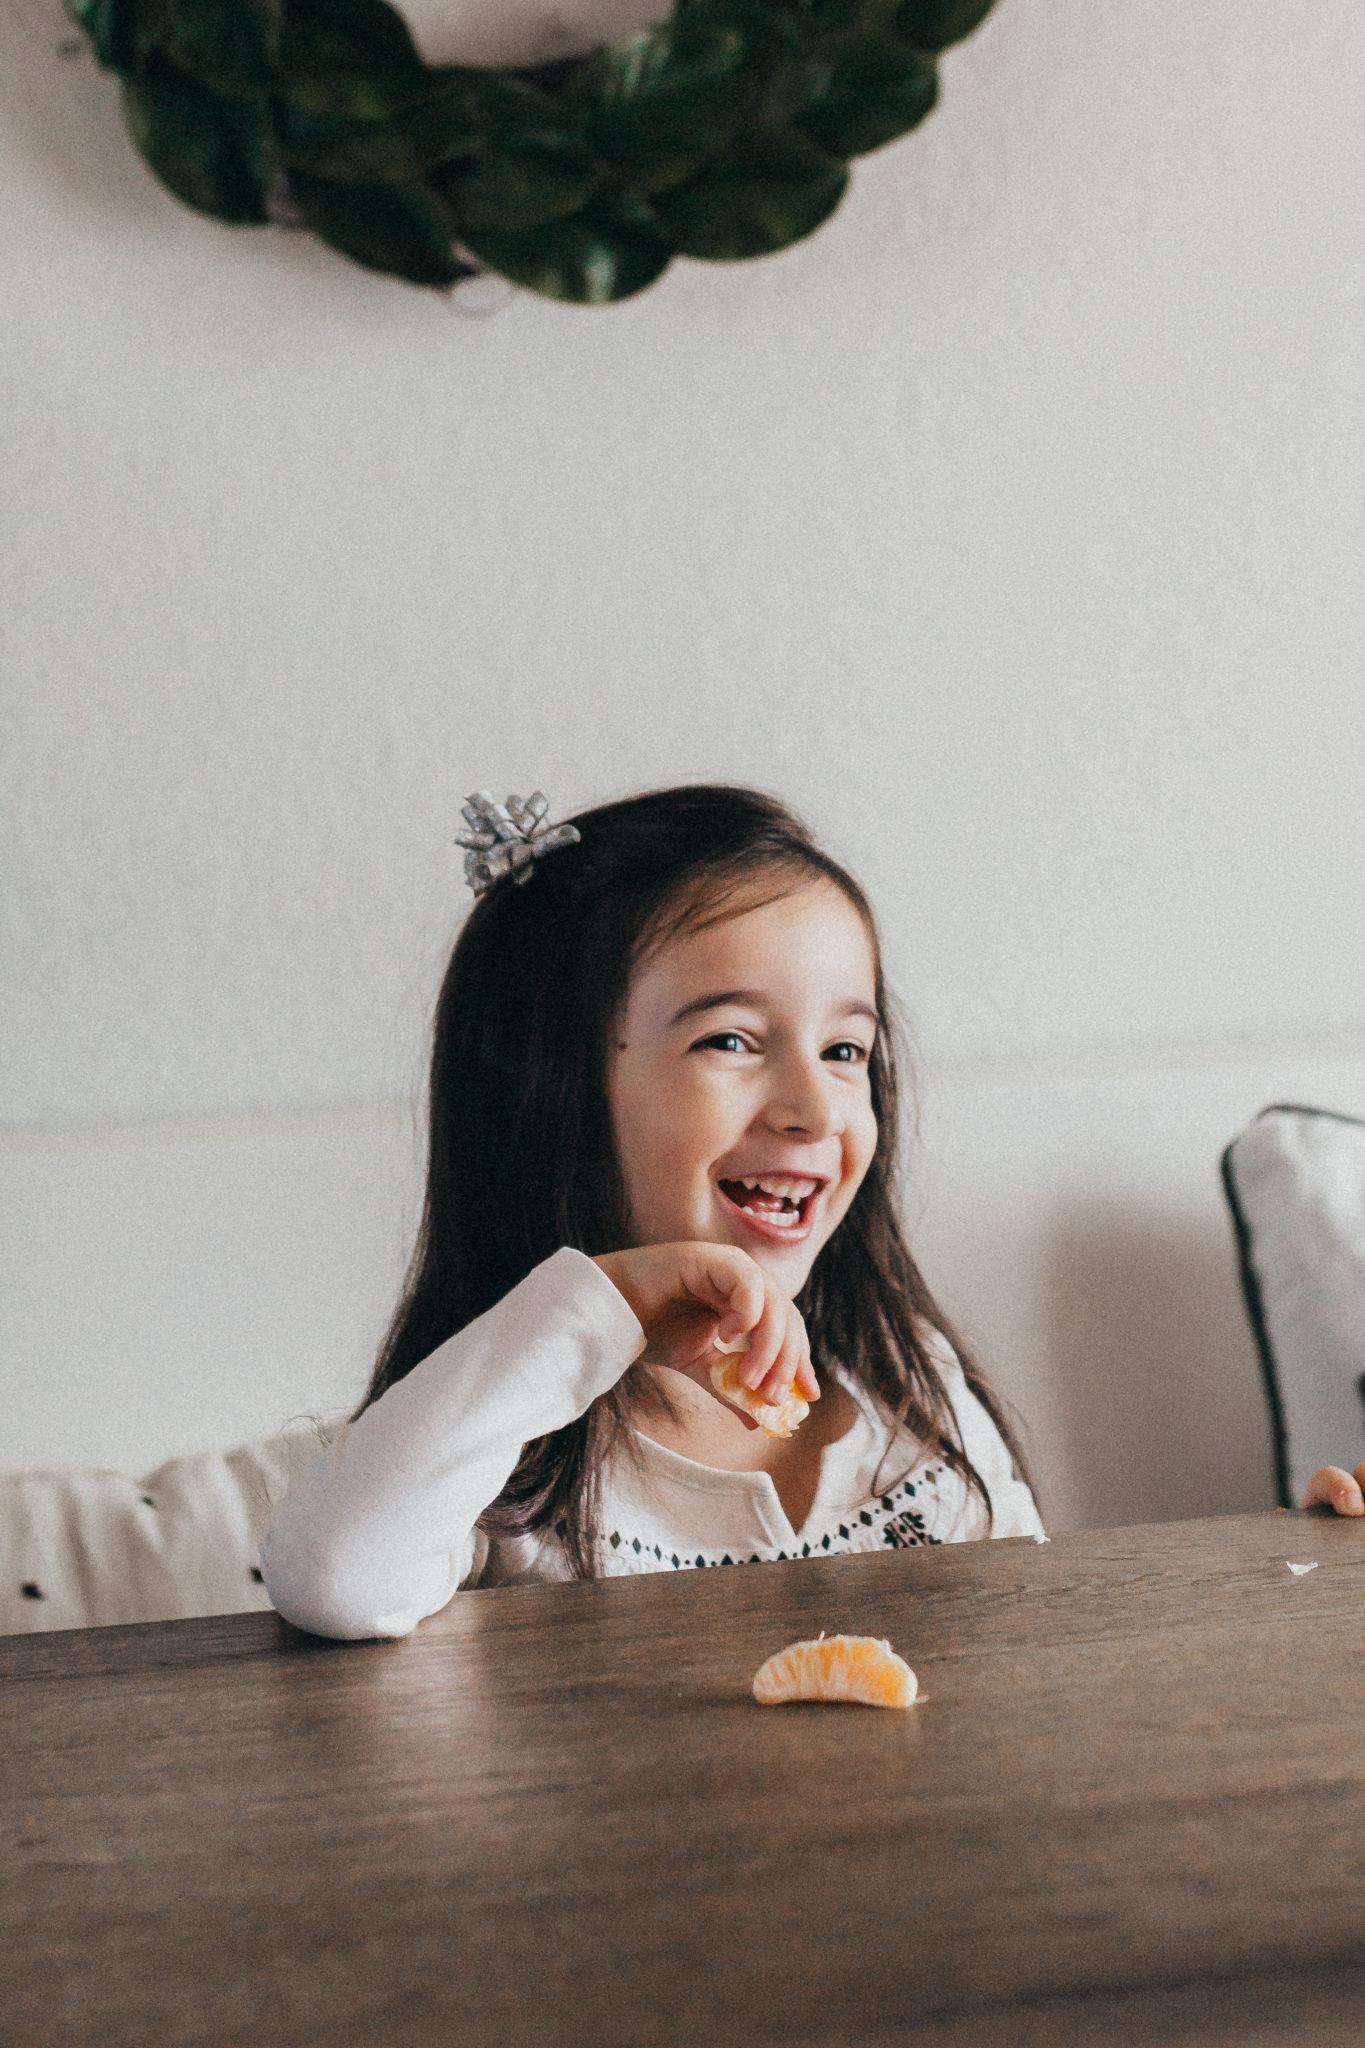 Orange Muffin recipe with yogurt and whole oranges, teaching kids kindness with Cuties #100daysofsunshine #ad